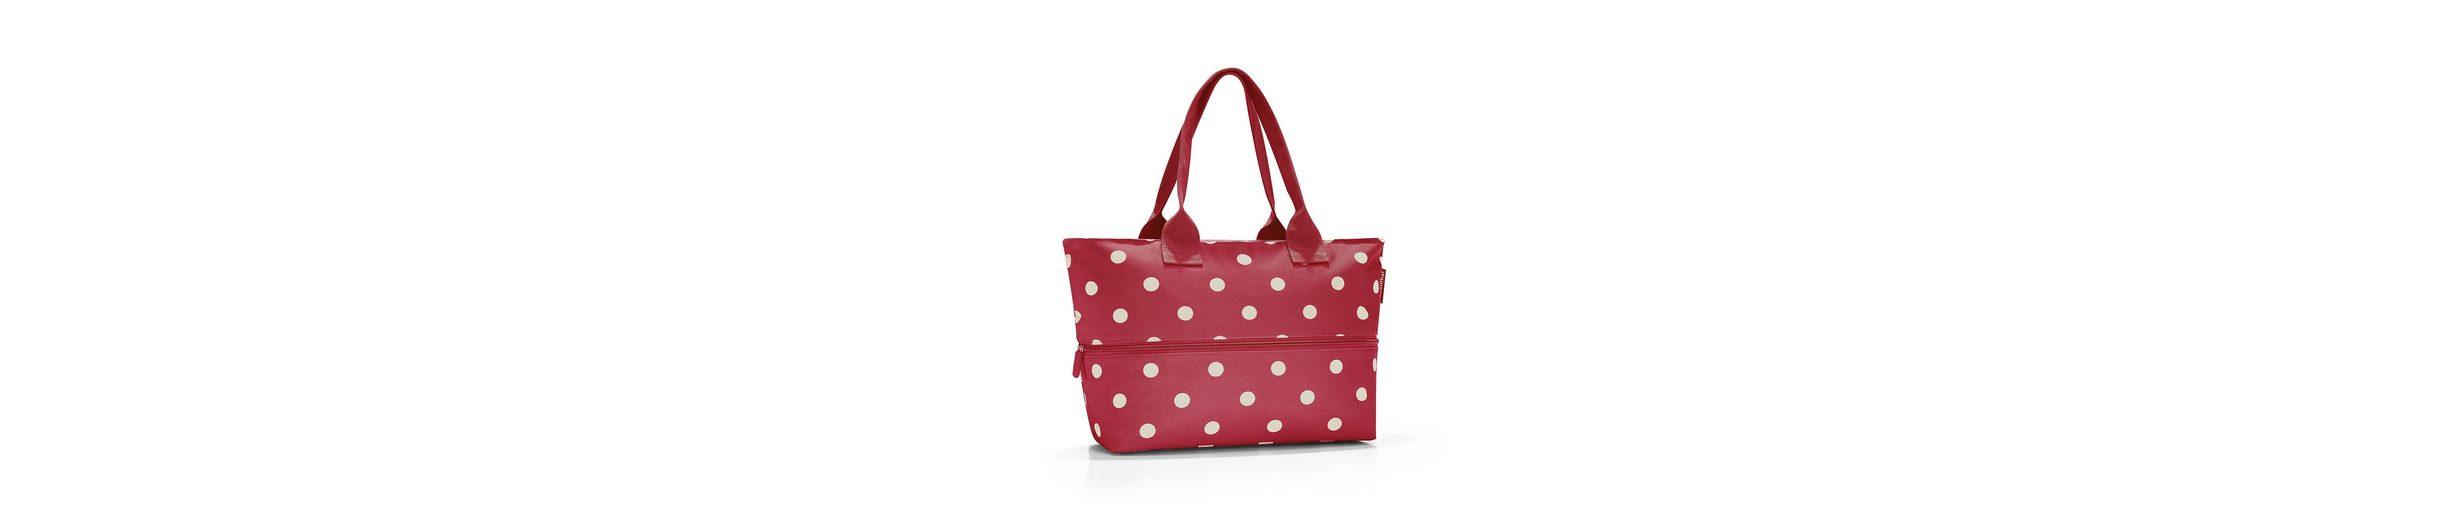 Reisenthel® Shopper e1 ruby dots